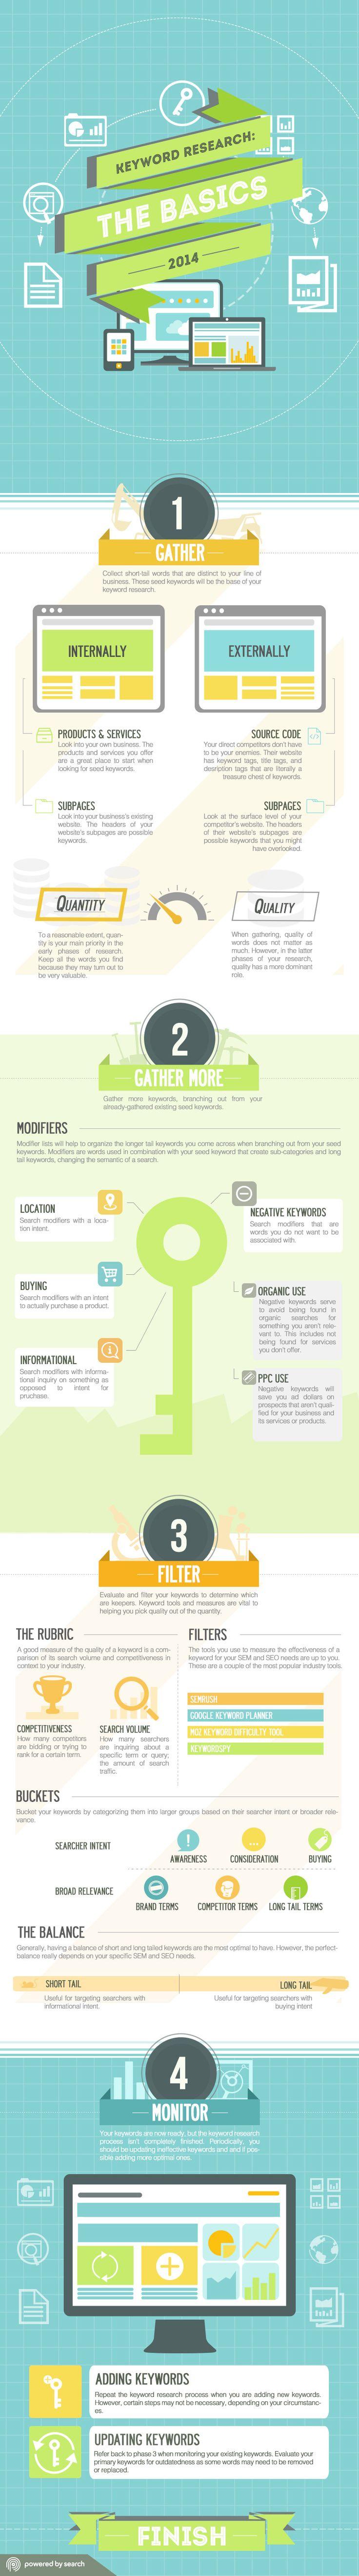 Keyword Research: The Basics 2014   #infographic #KeywordResearch #SEO